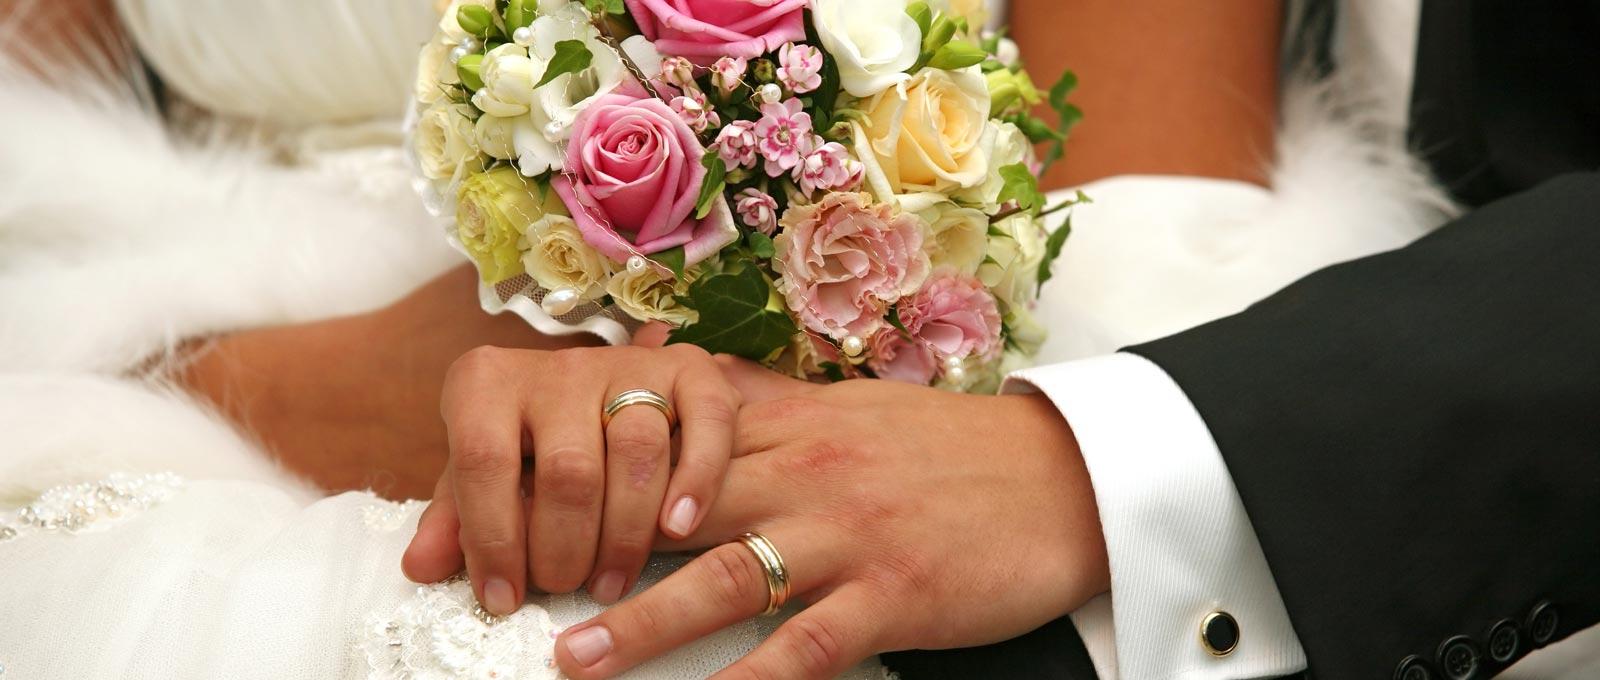 Location de salles de mariage en charente maritime